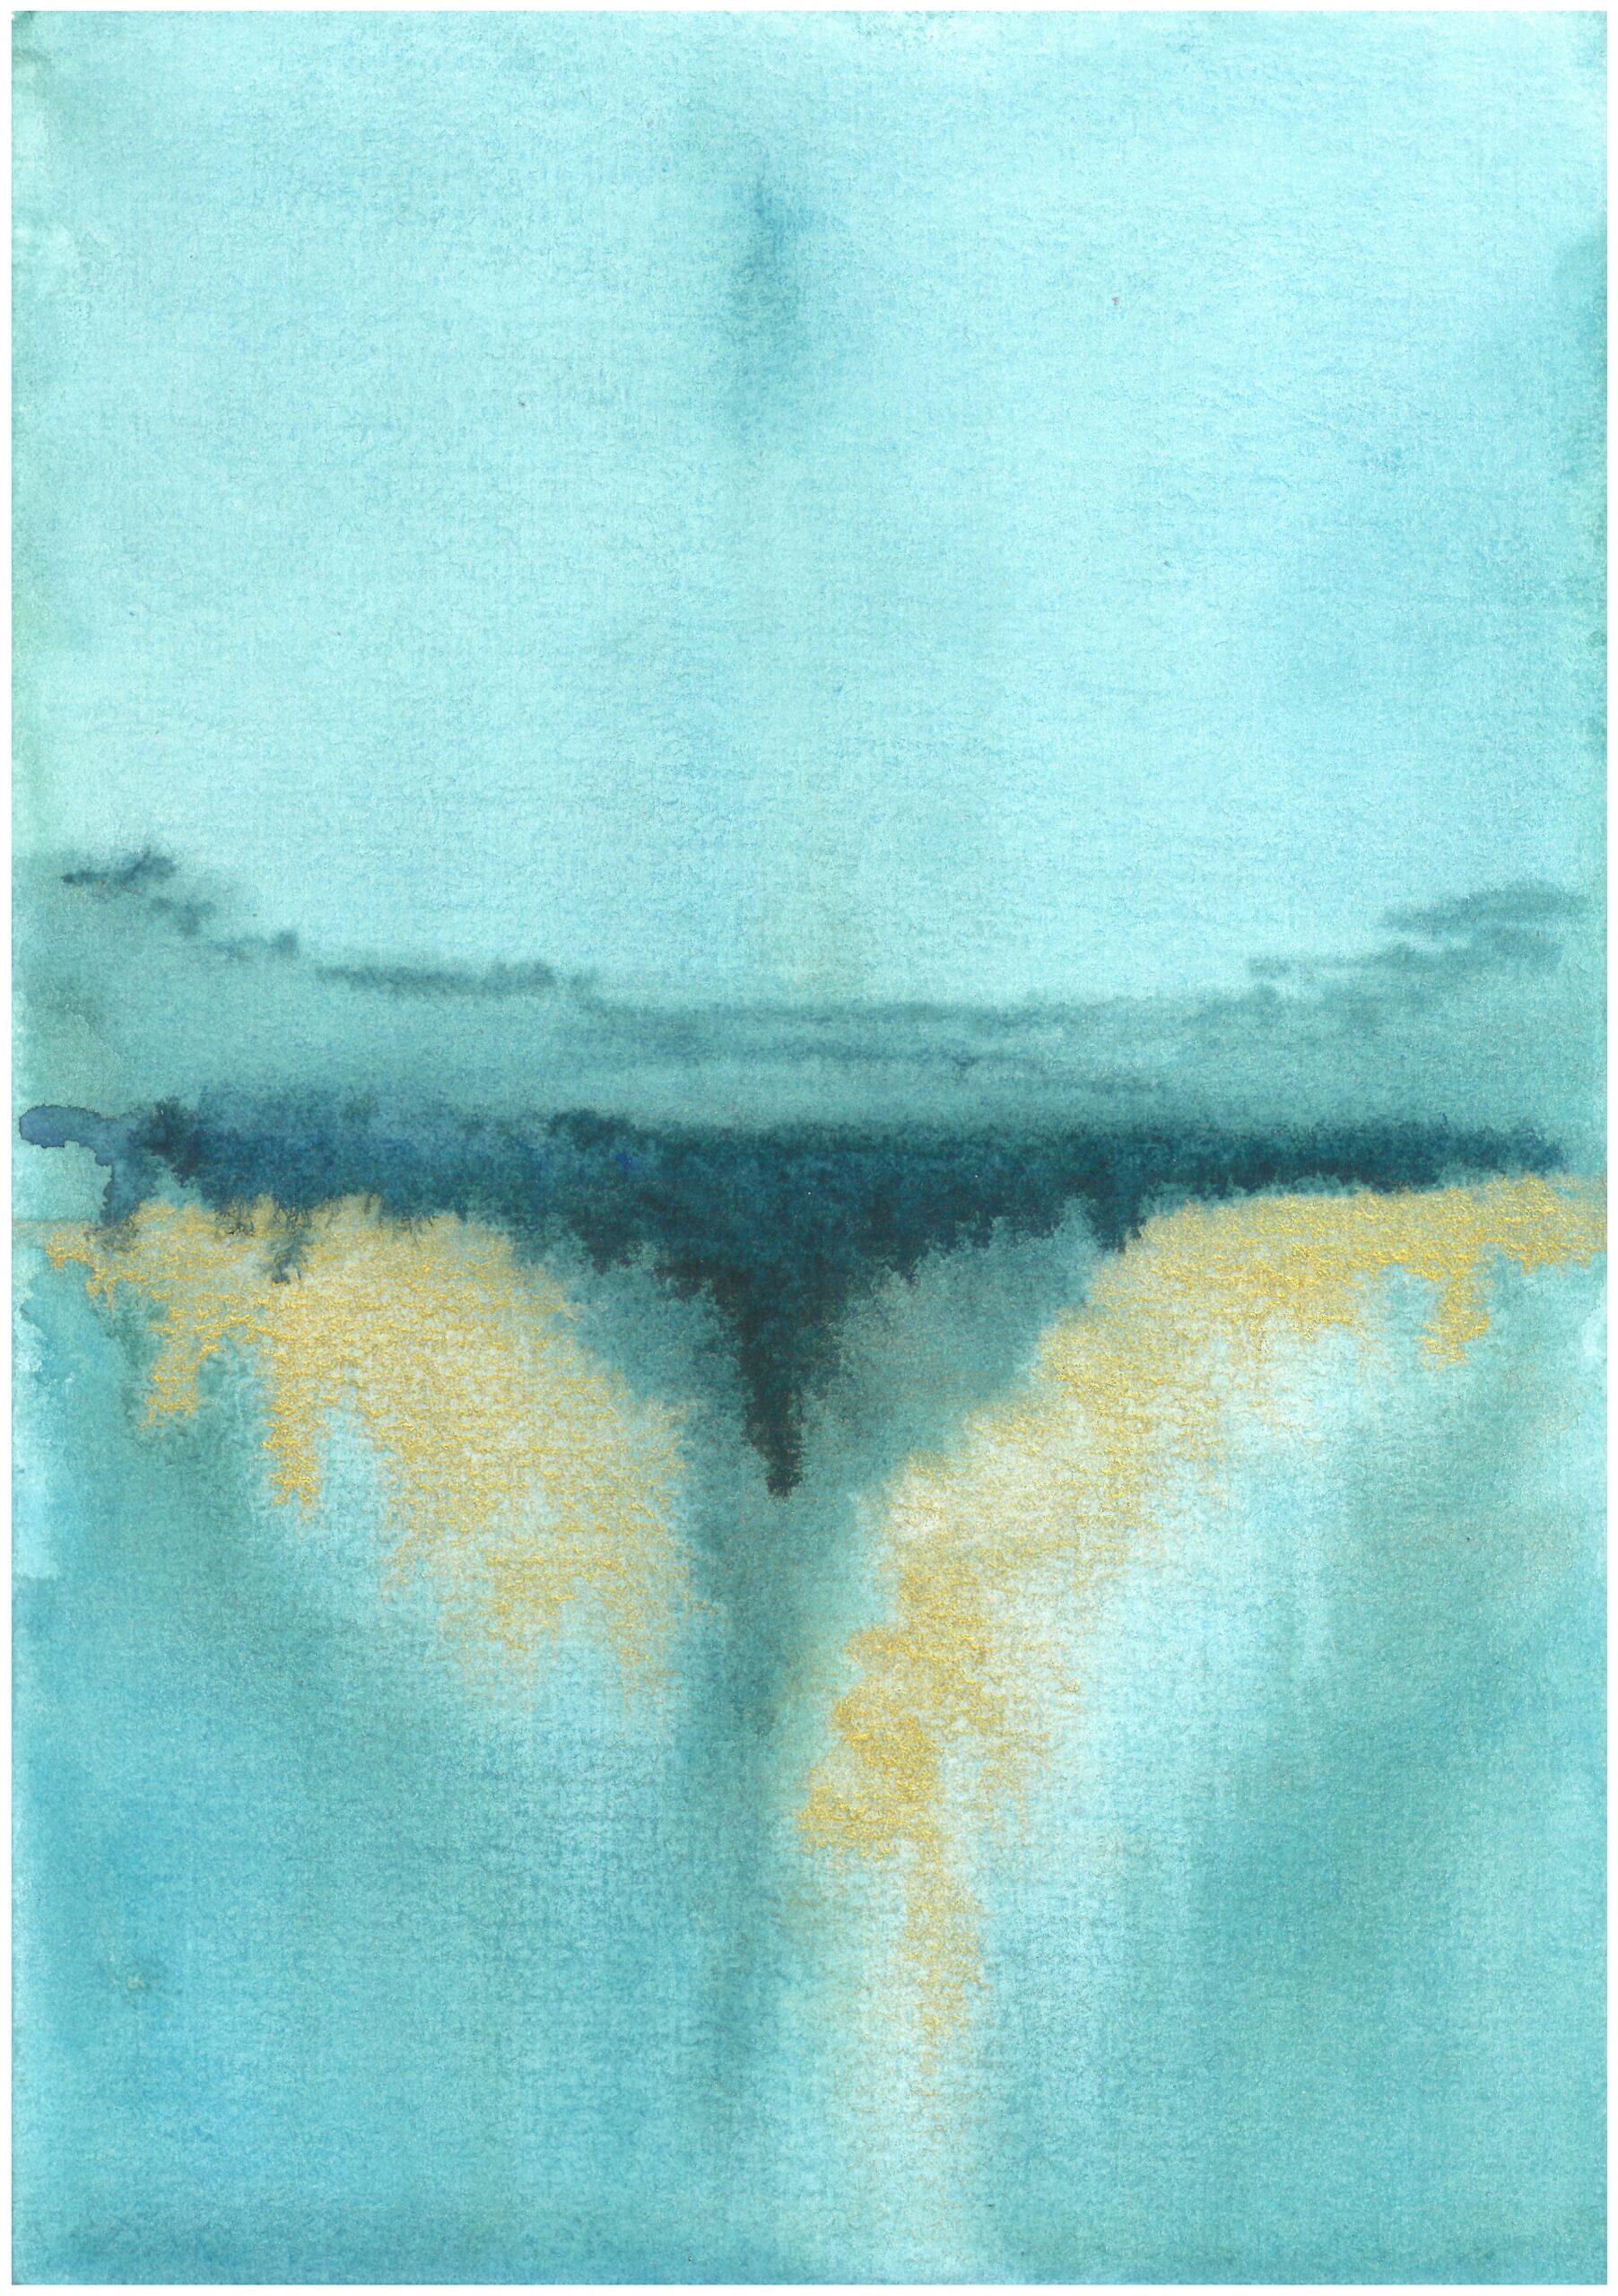 Seascape 2 Caoimhe O'Dwyer